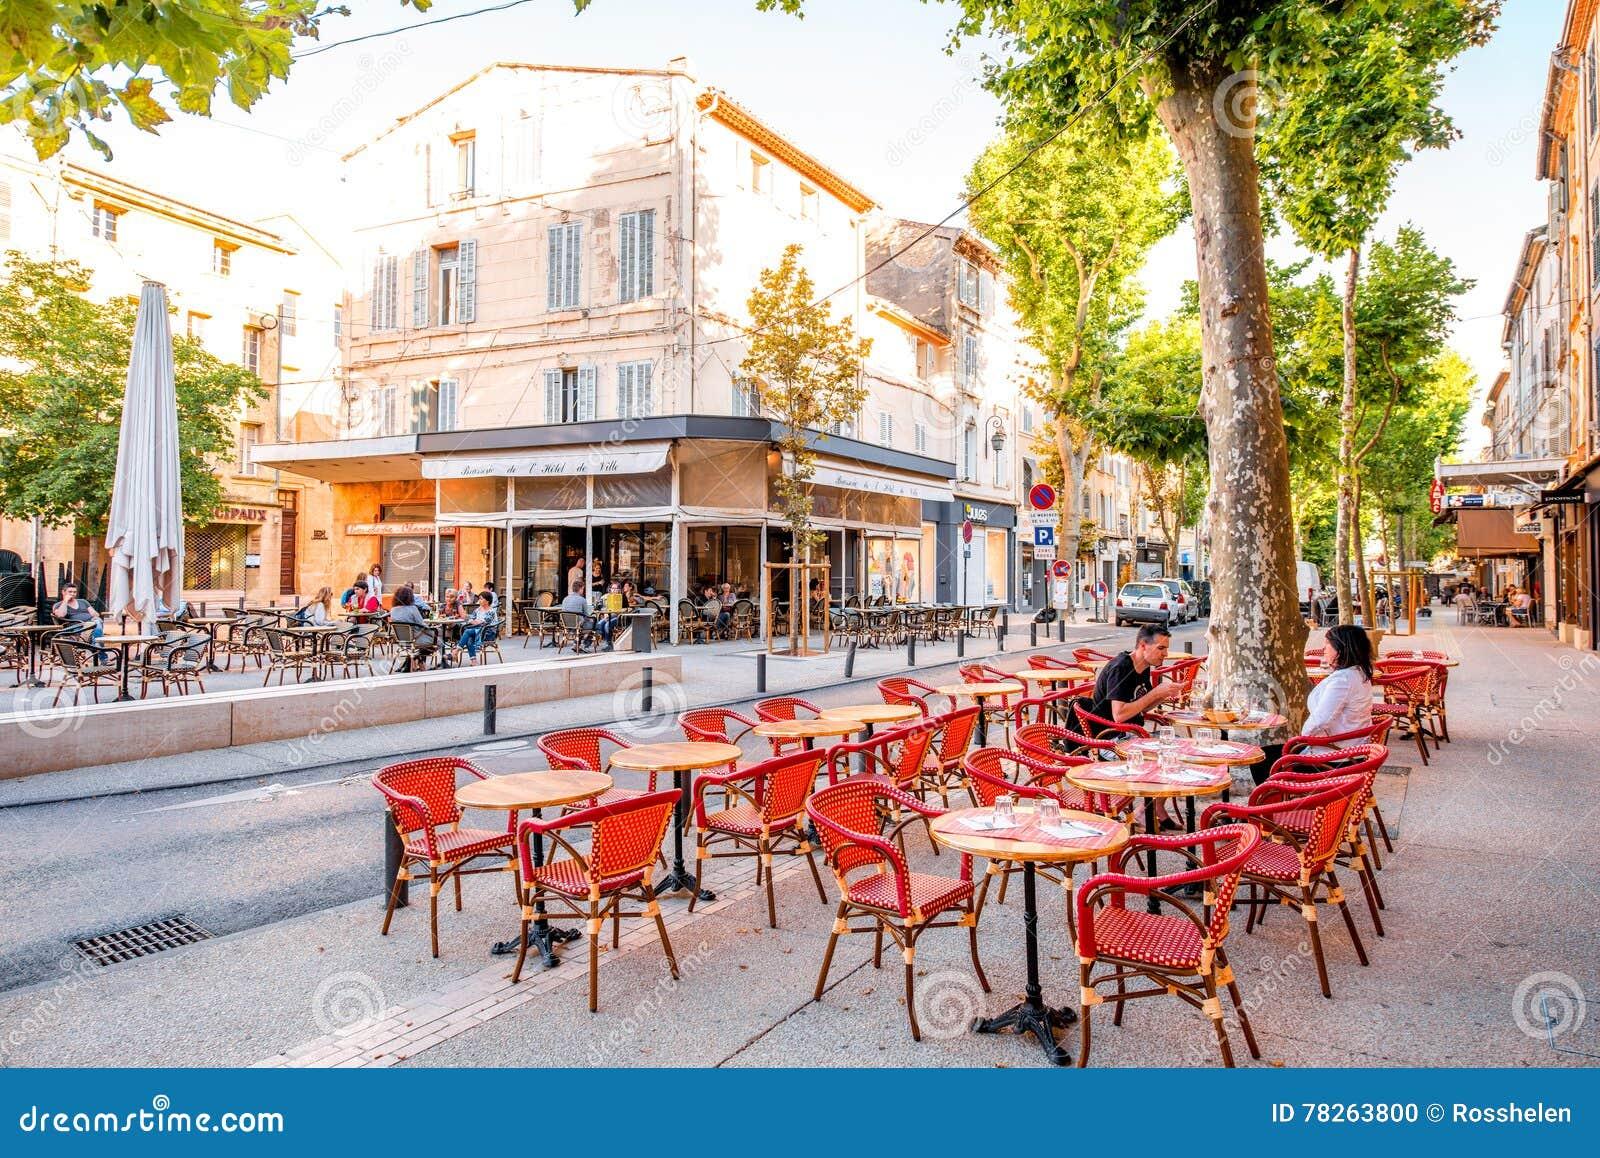 Salon de provence city in france editorial image image - Caf salon de provence ...